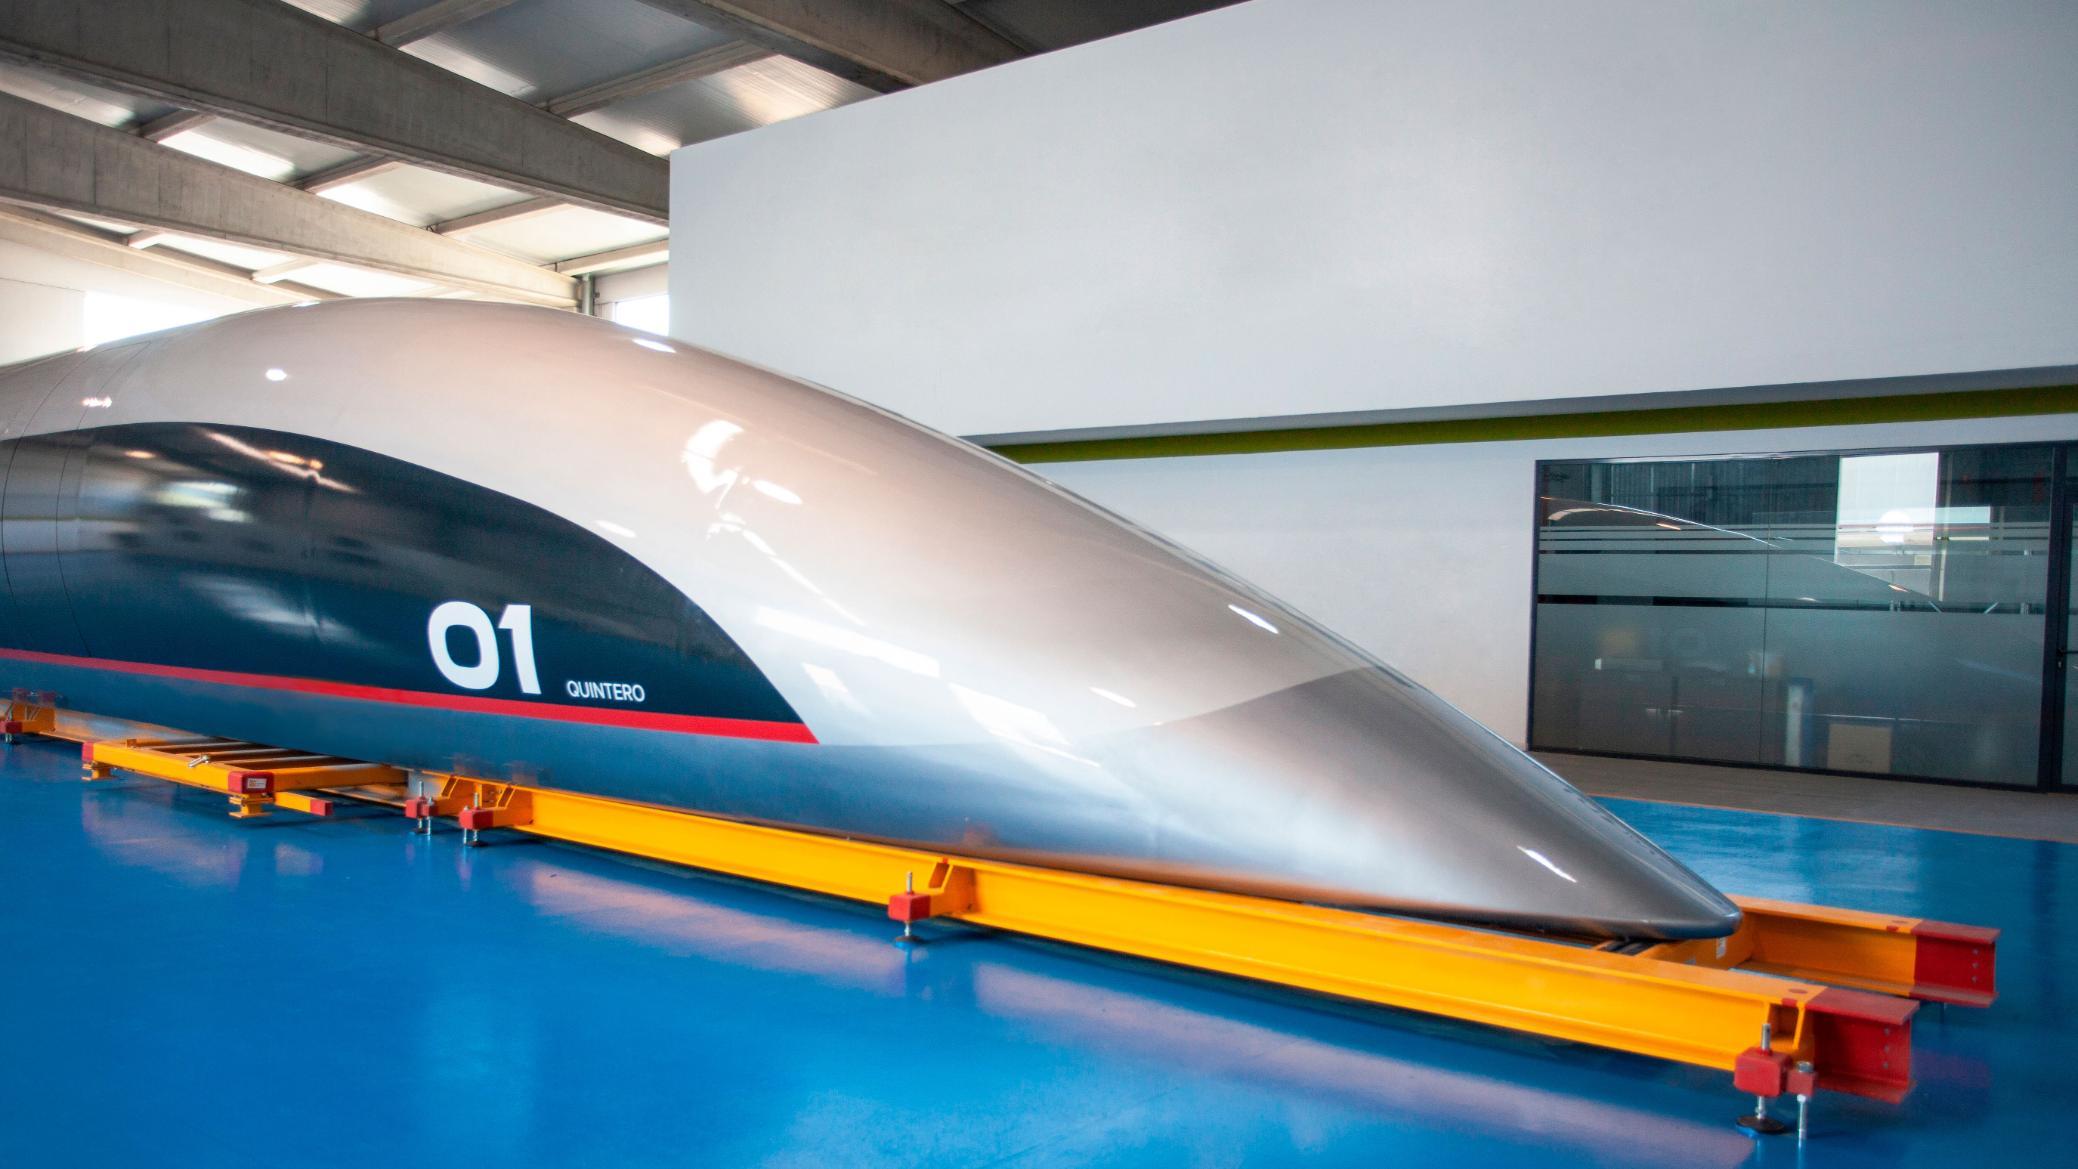 Hyperloop capsule is full-sized and superfast | CNN Travel